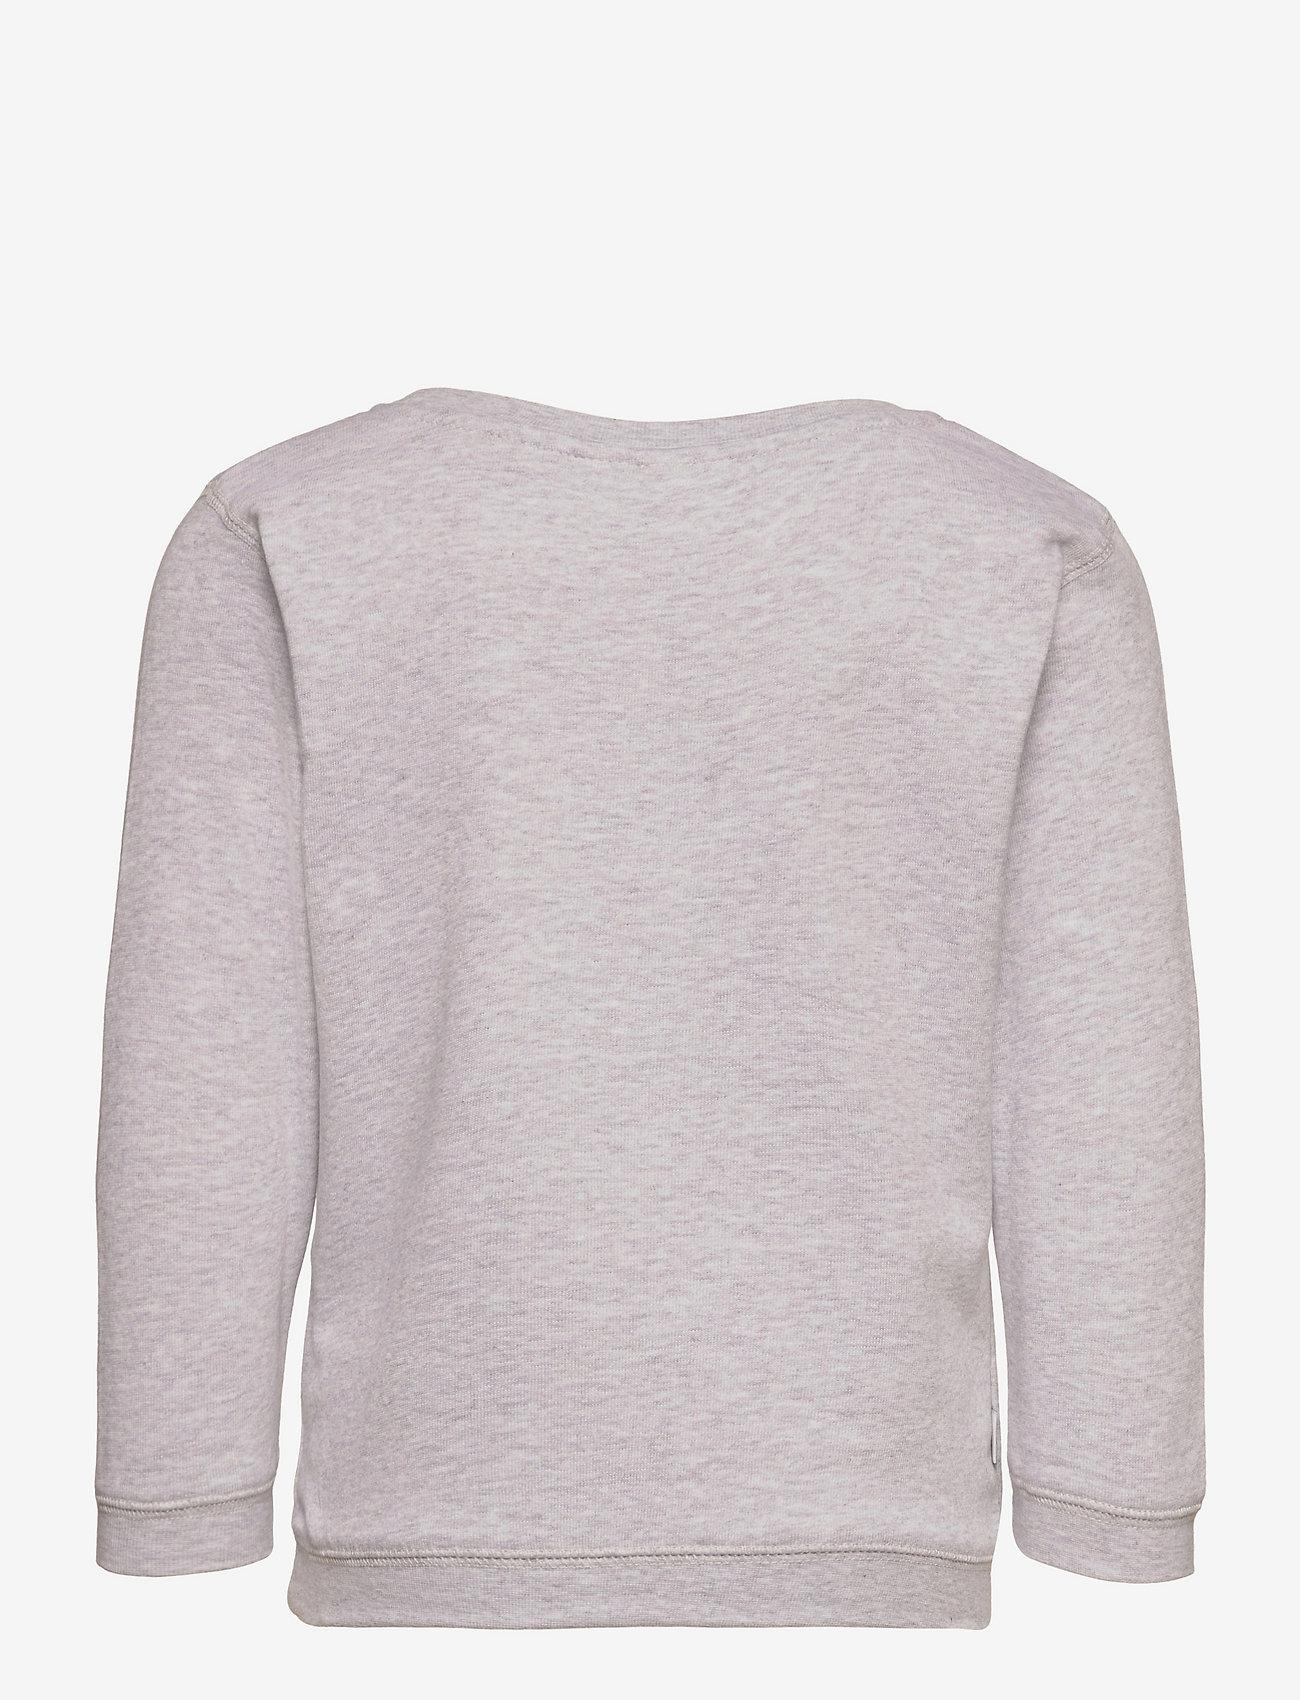 Makia - Trident Sweatshirt - sweatshirts - light grey - 1